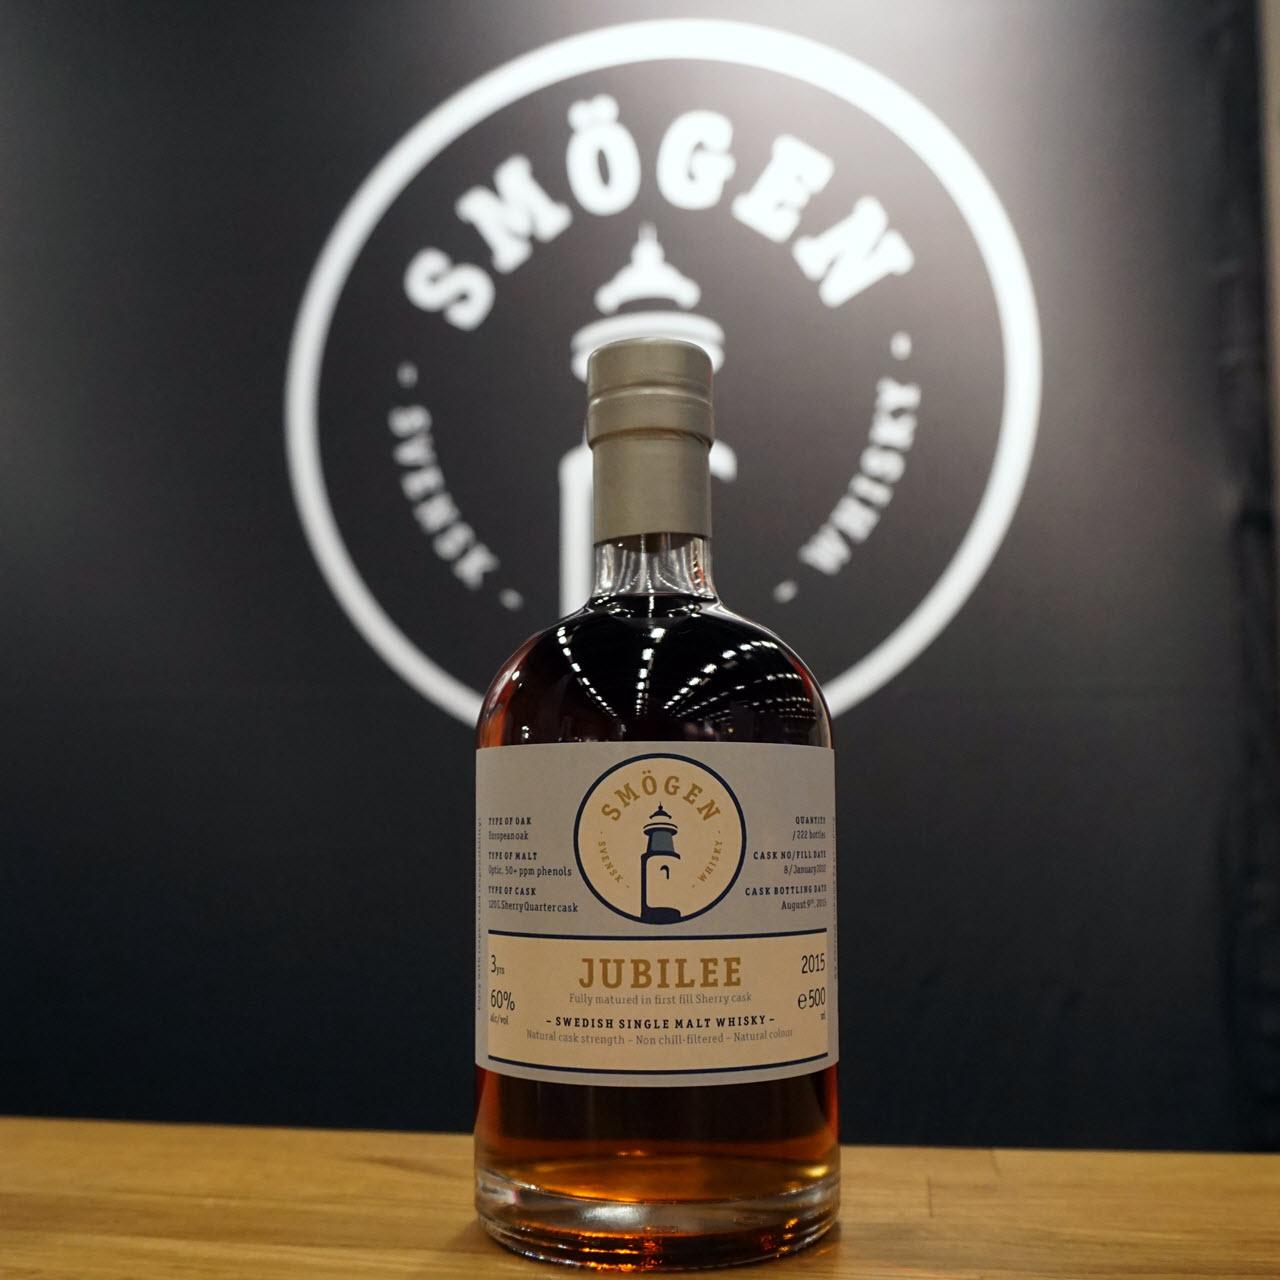 Smögen Jubilee